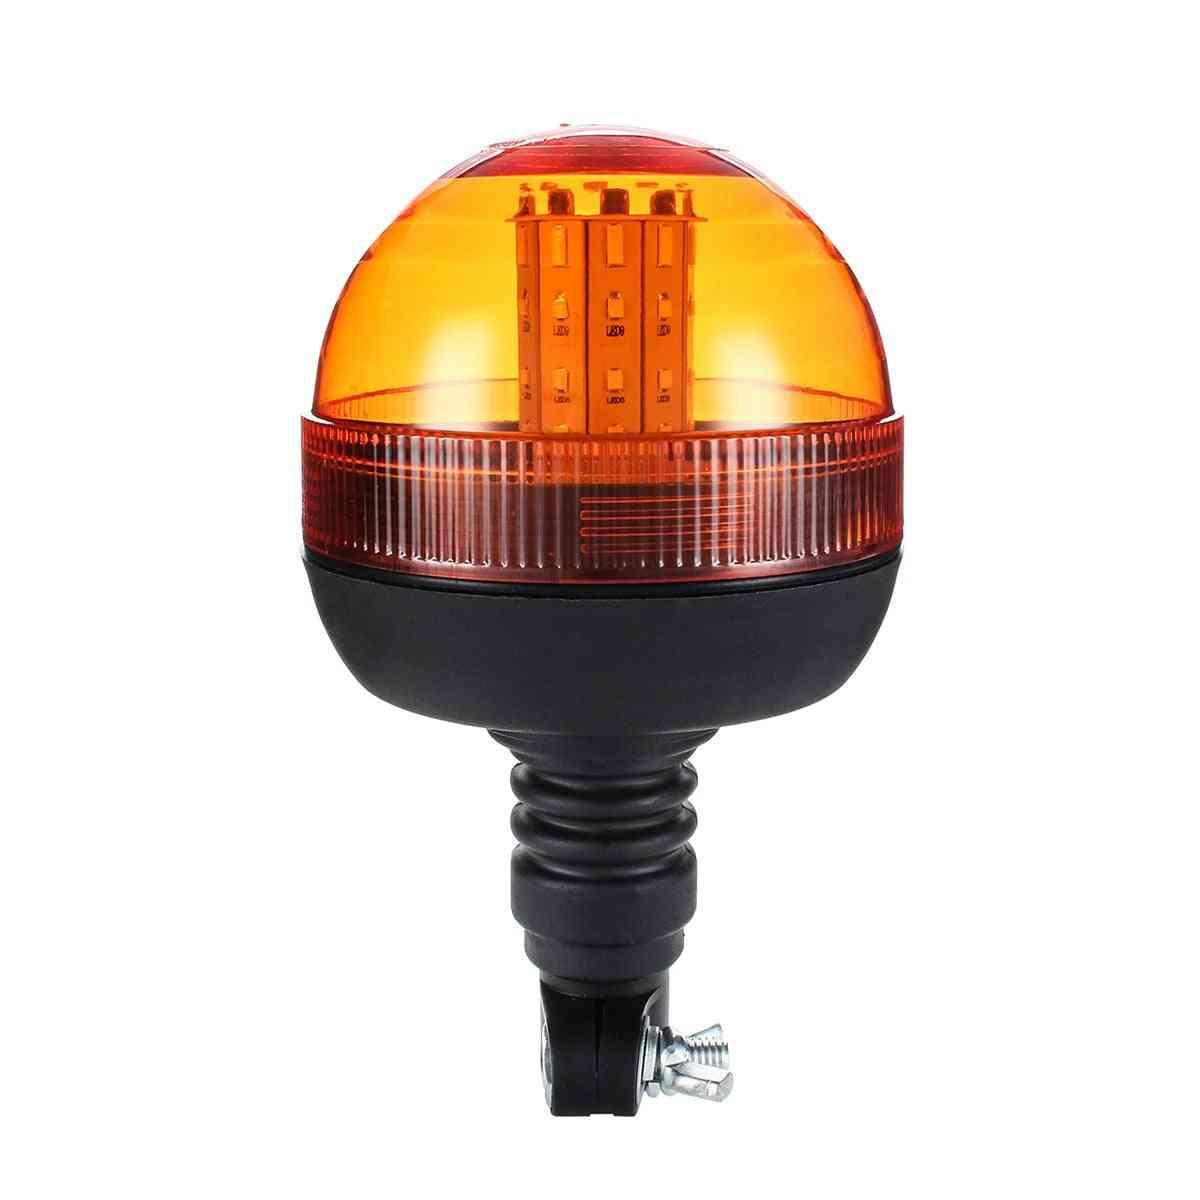 Safurance Led Rotating Flashing Amber Beacon Flexible Tractor Warning Light